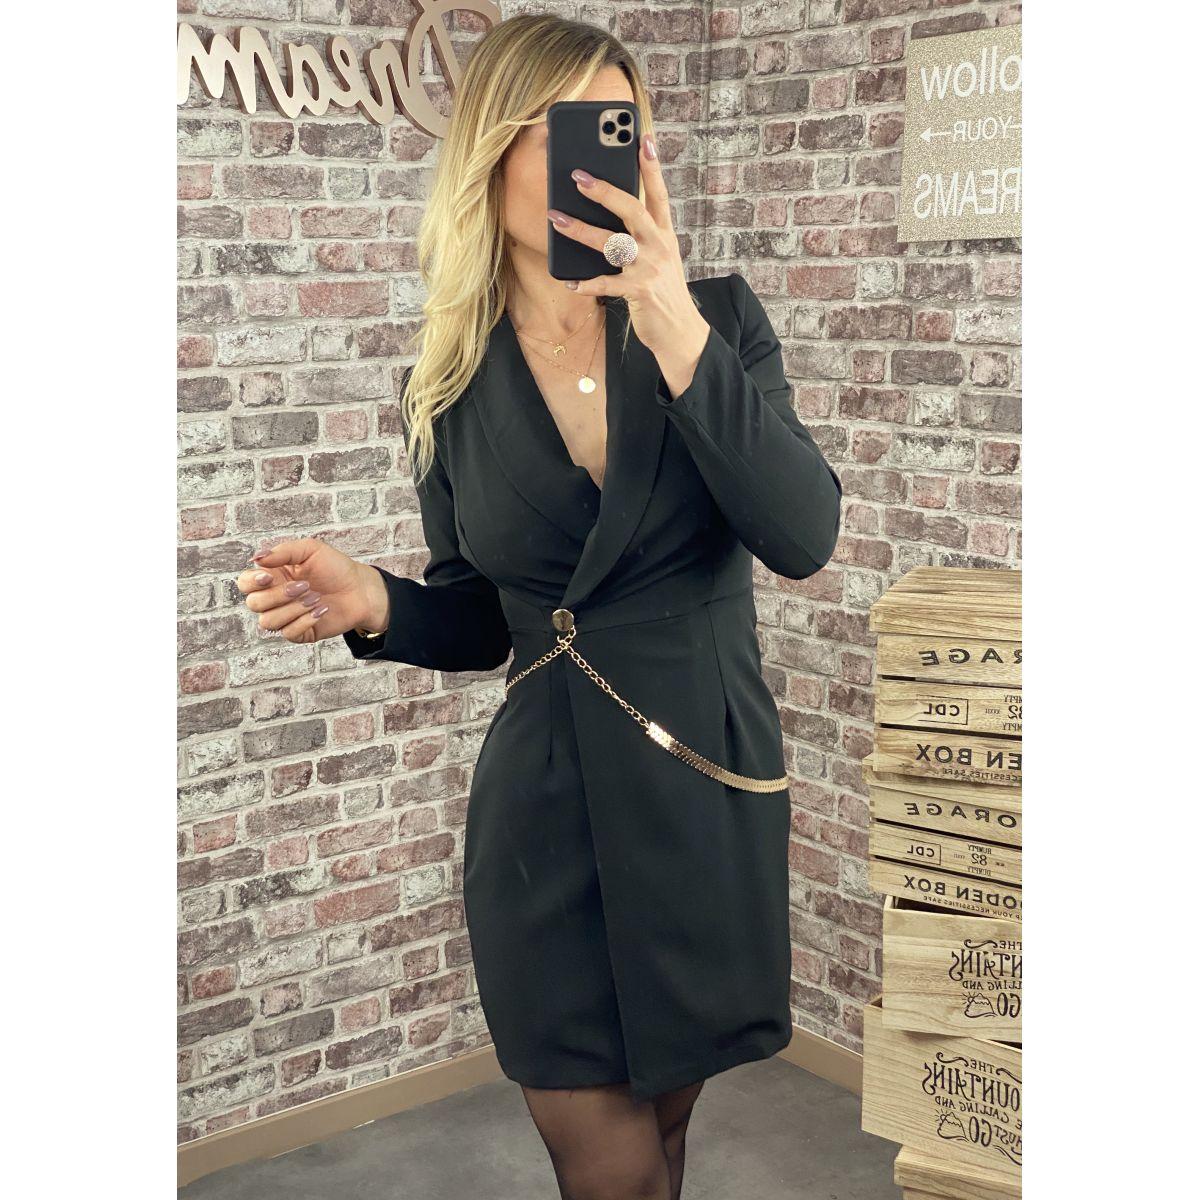 Robe blazer noire détail chaine gold